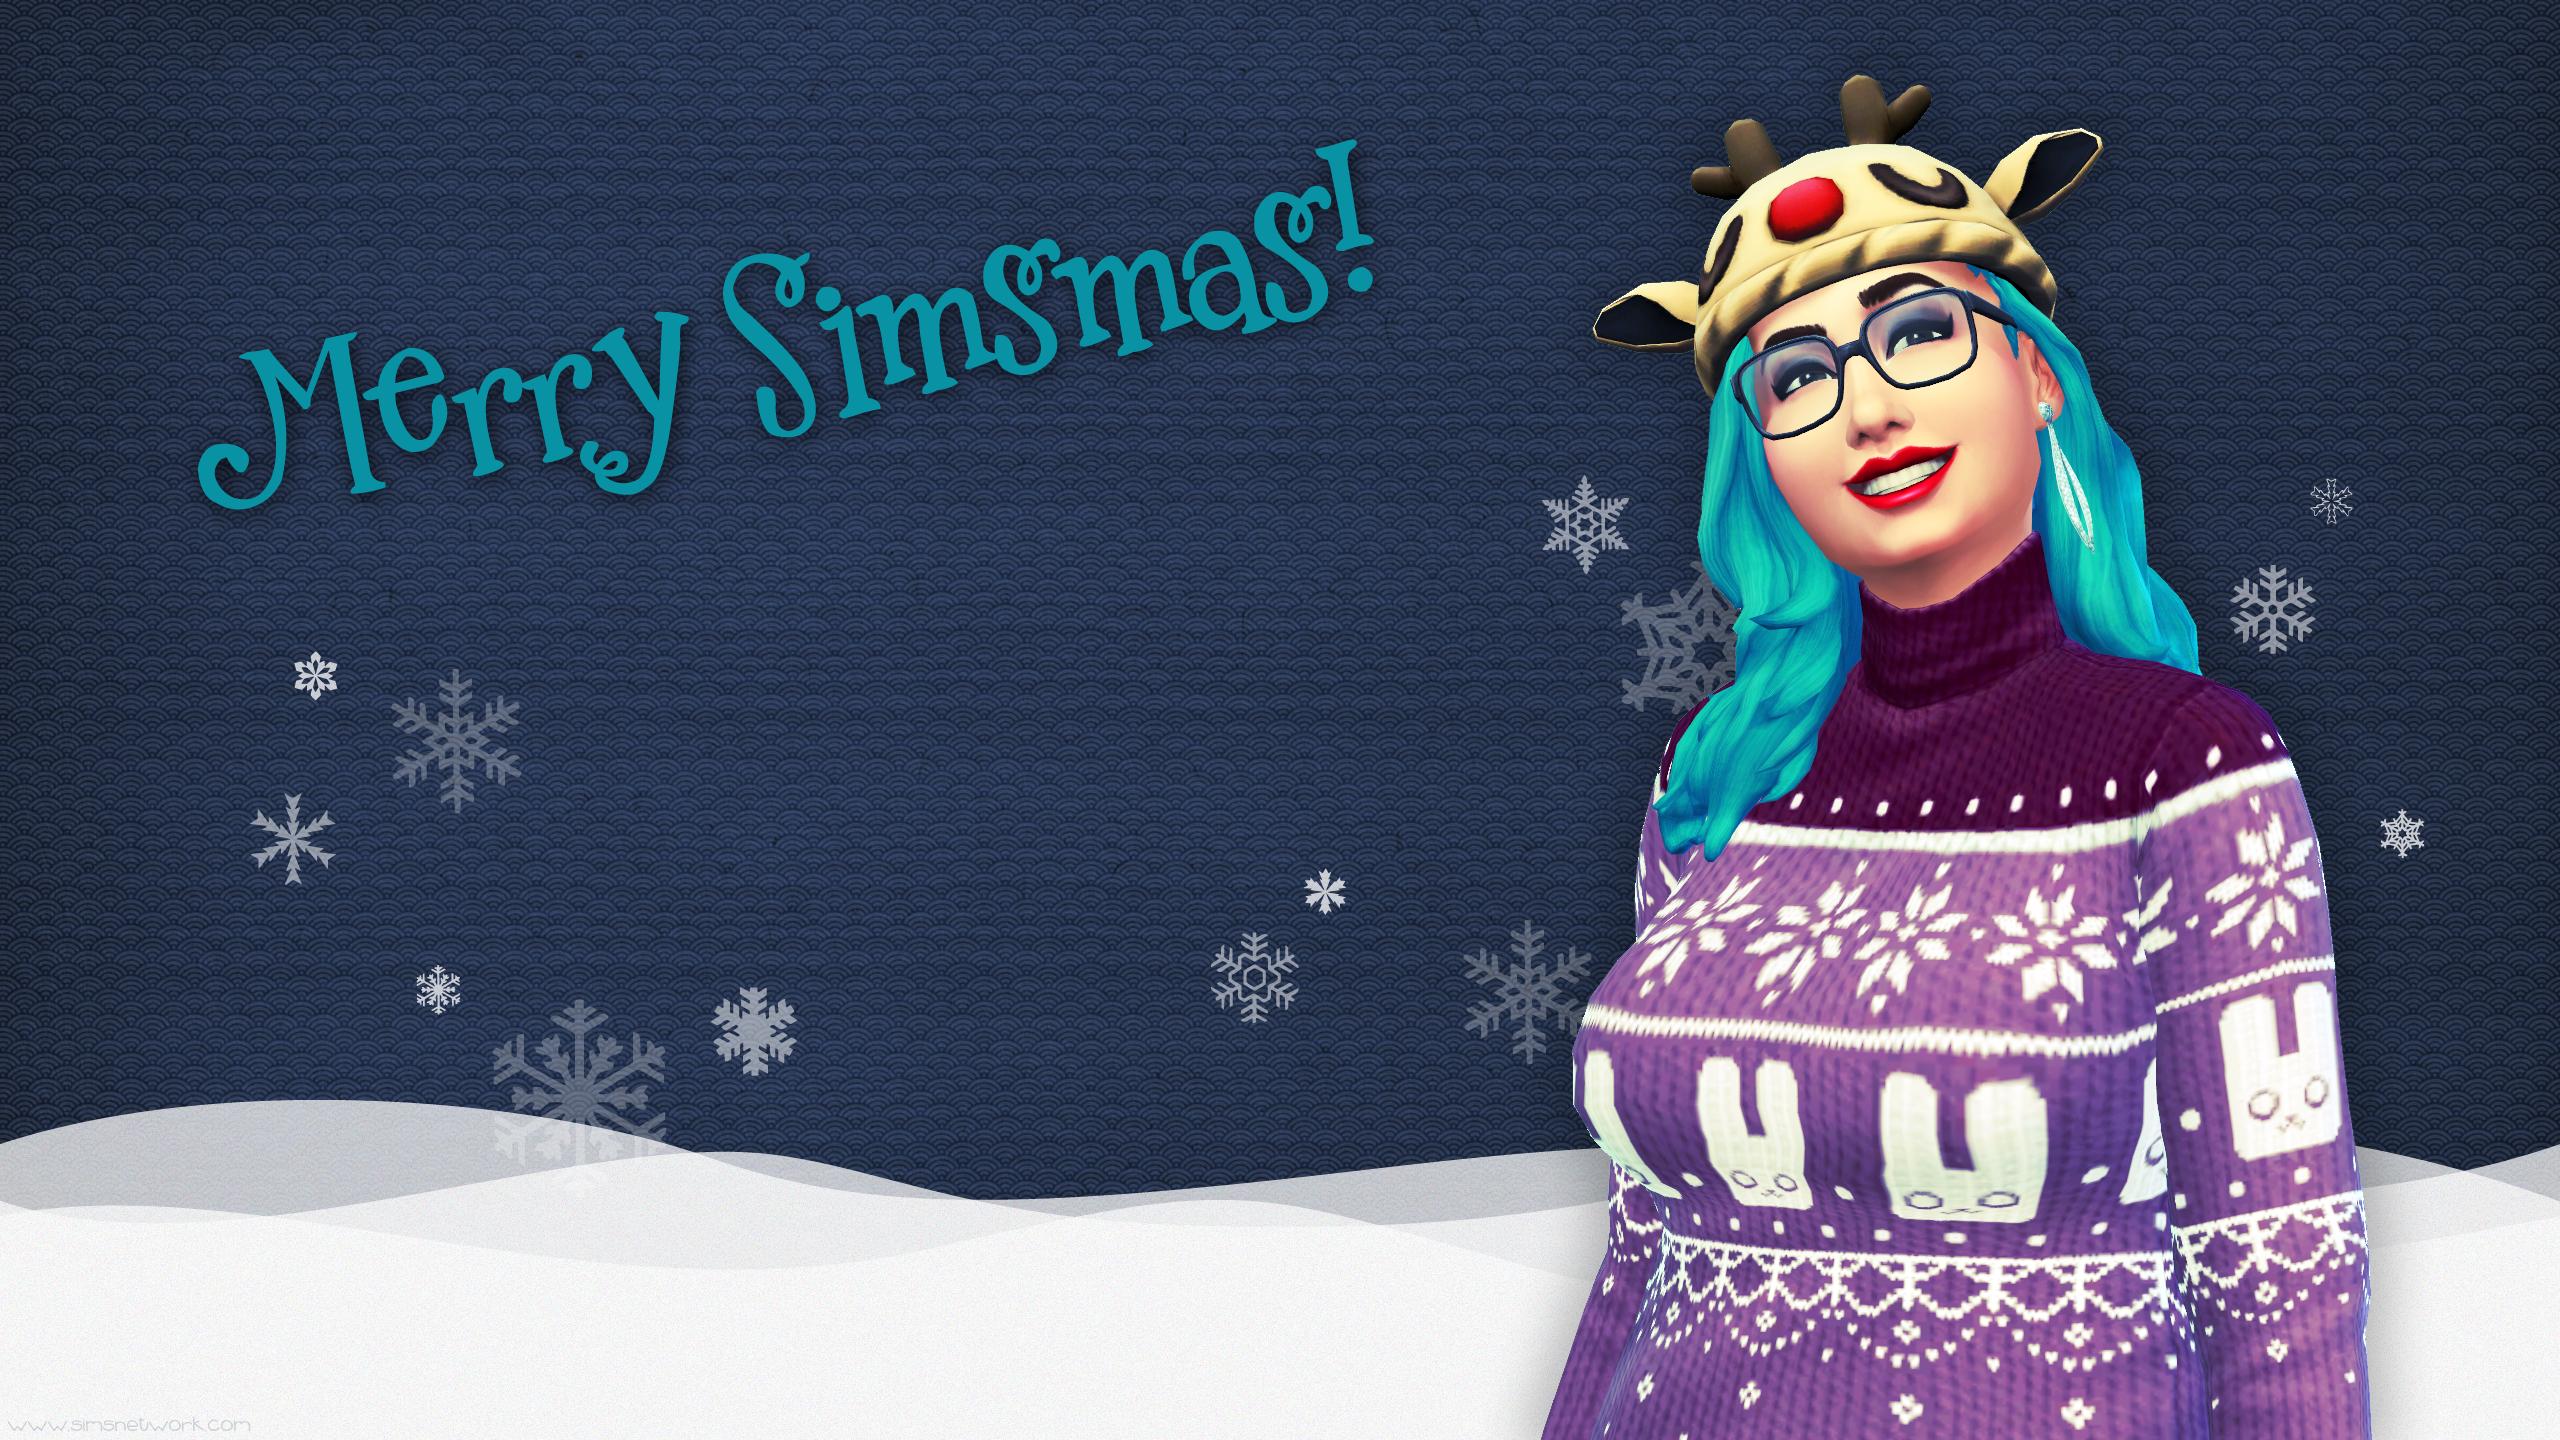 Merry Simsmas 2015 Christmas wallpaper